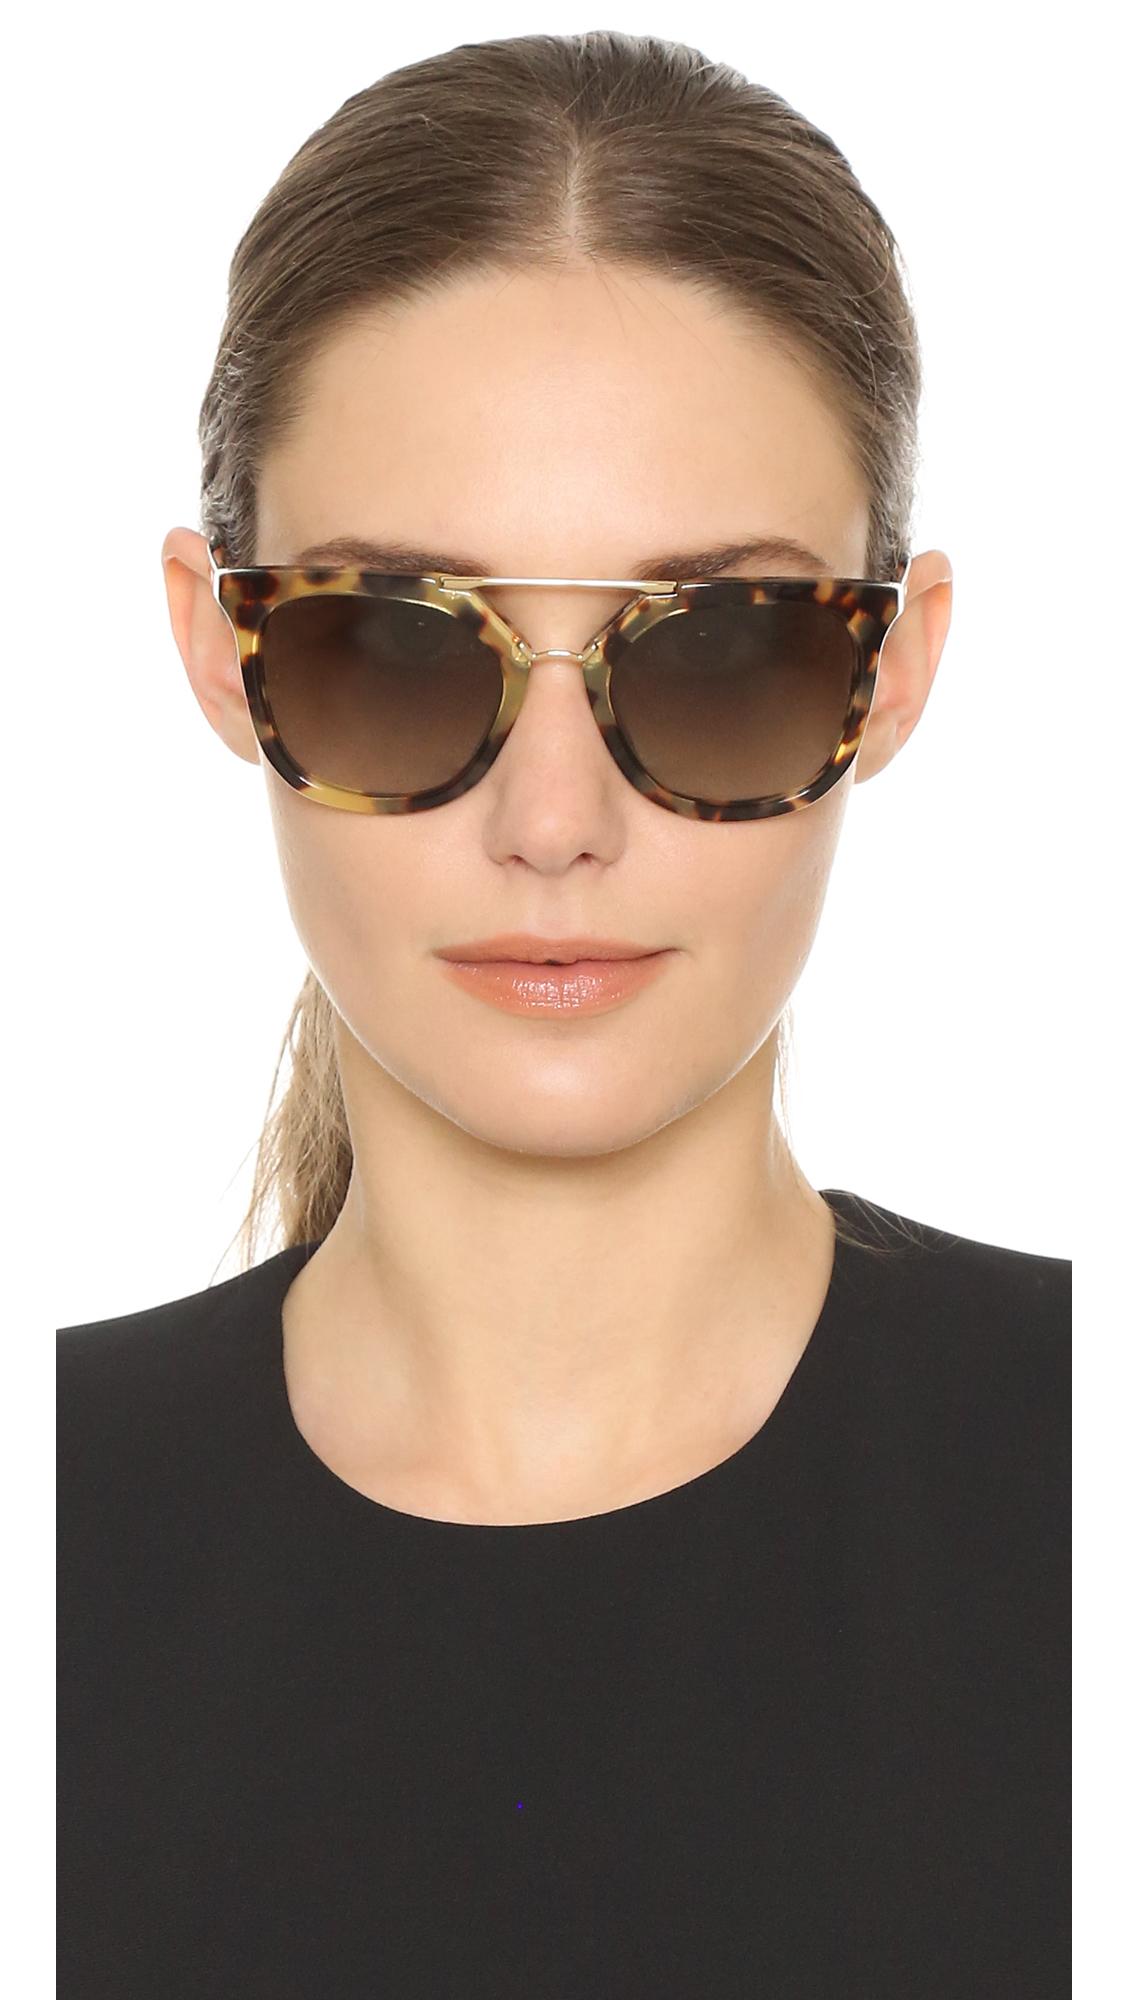 5db6d279a Prada Thick Frame Aviator Sunglasses in Green - Lyst